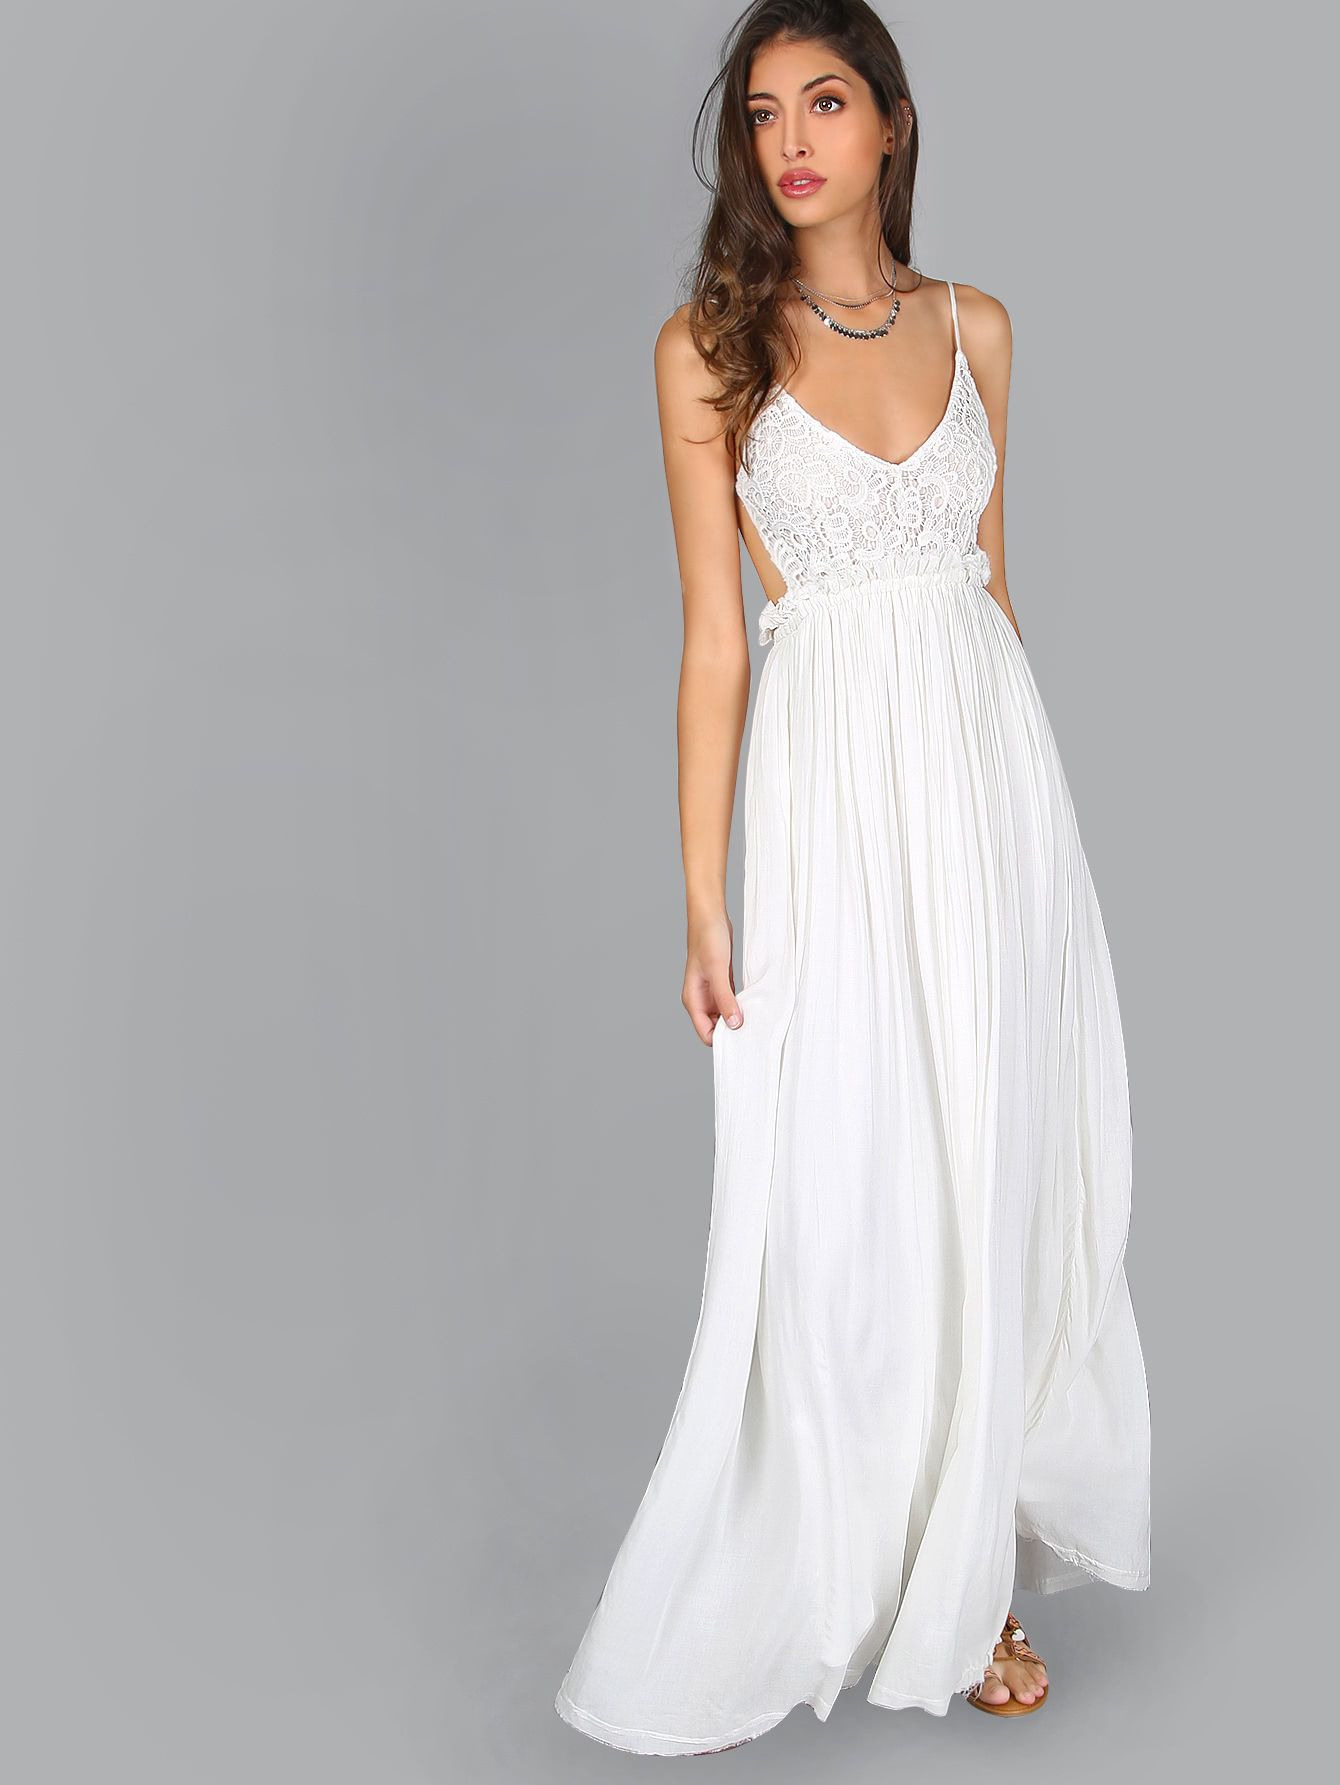 Formal Perfekt Kleid Lang Weiß Spezialgebiet20 Elegant Kleid Lang Weiß Boutique